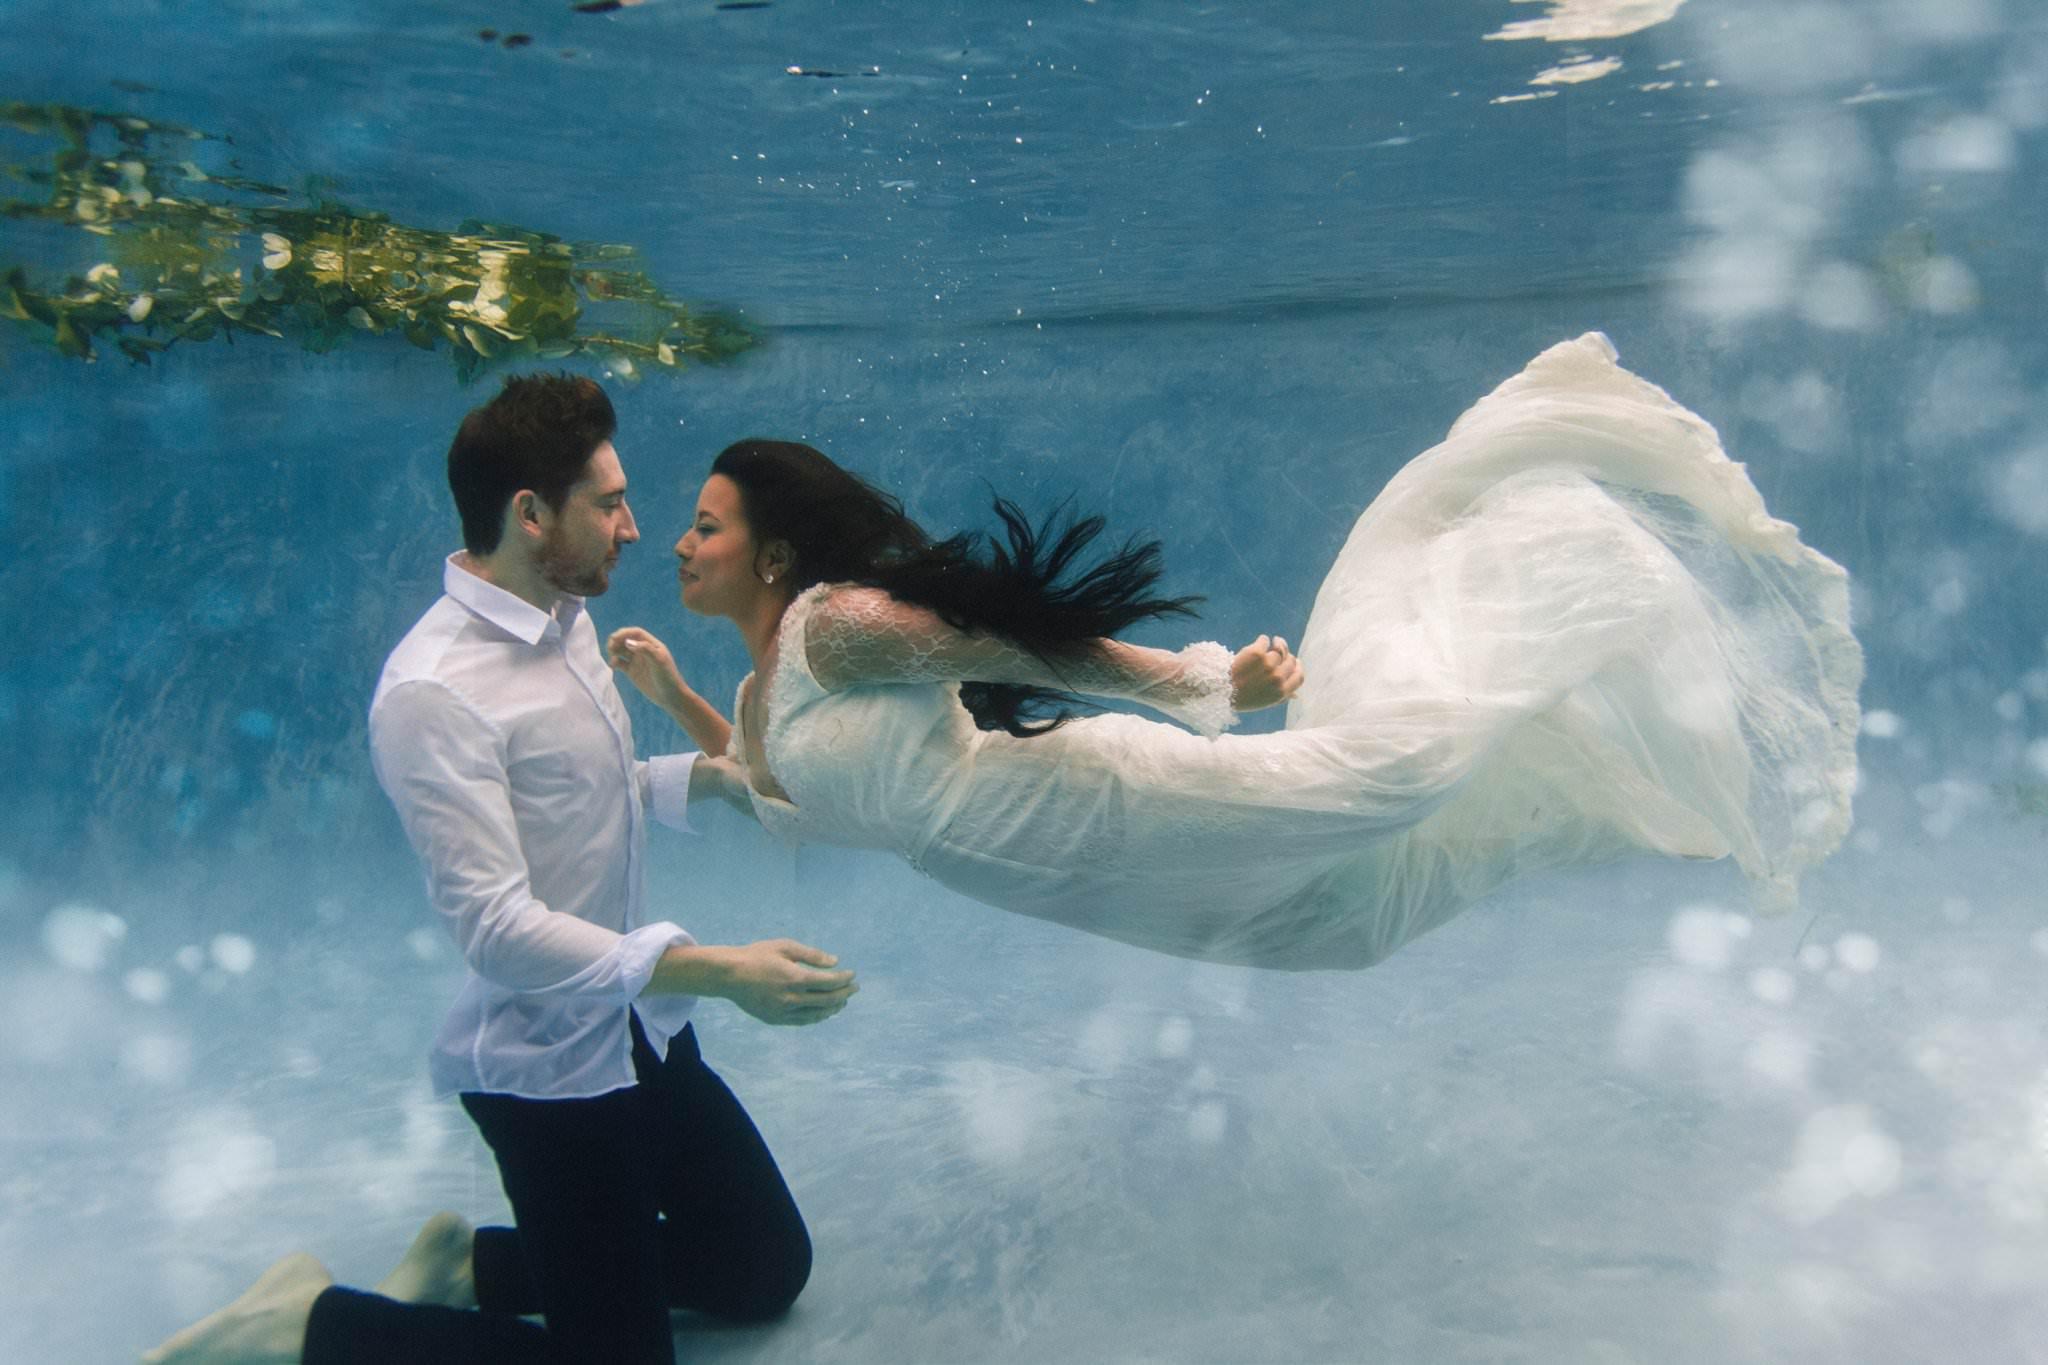 Arizona unique underwater wedding photography in a pool